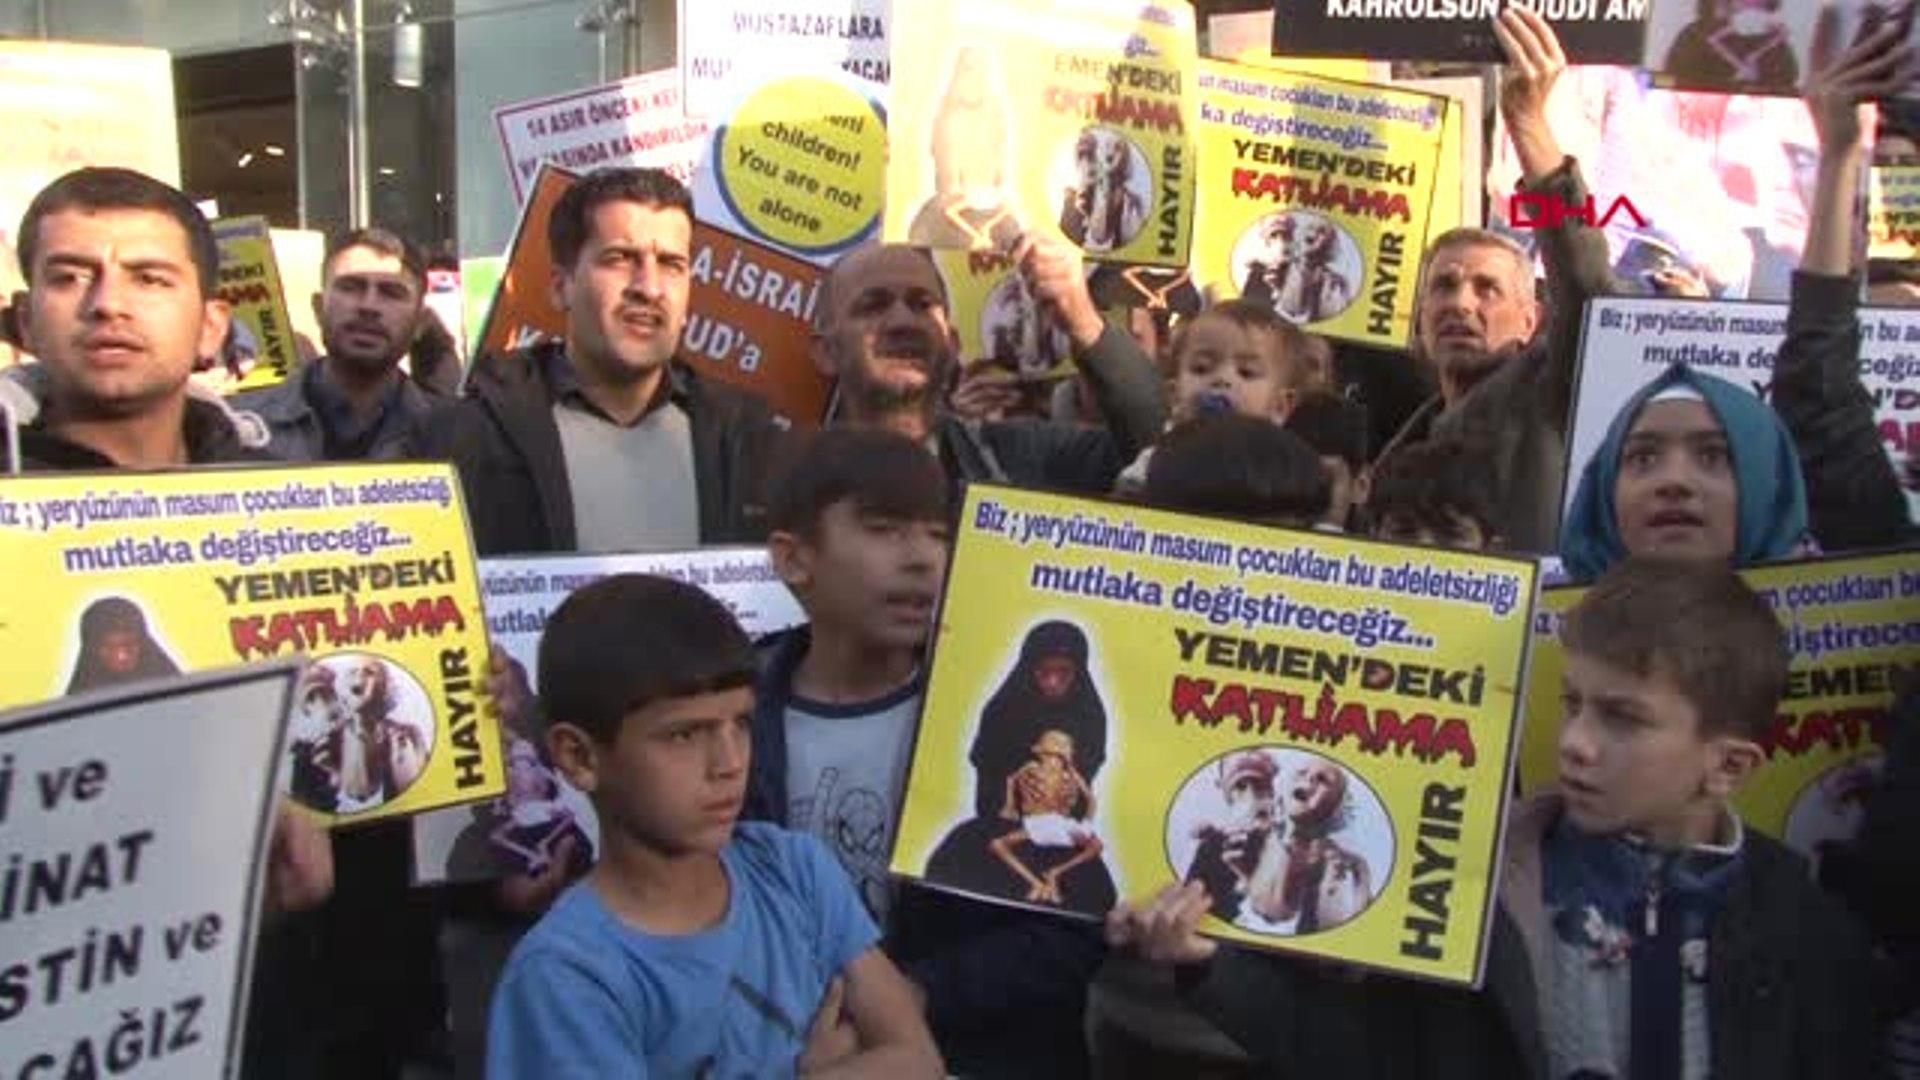 VİDEO- Diyarbakır'da Suudi Arabistan protesto edildi